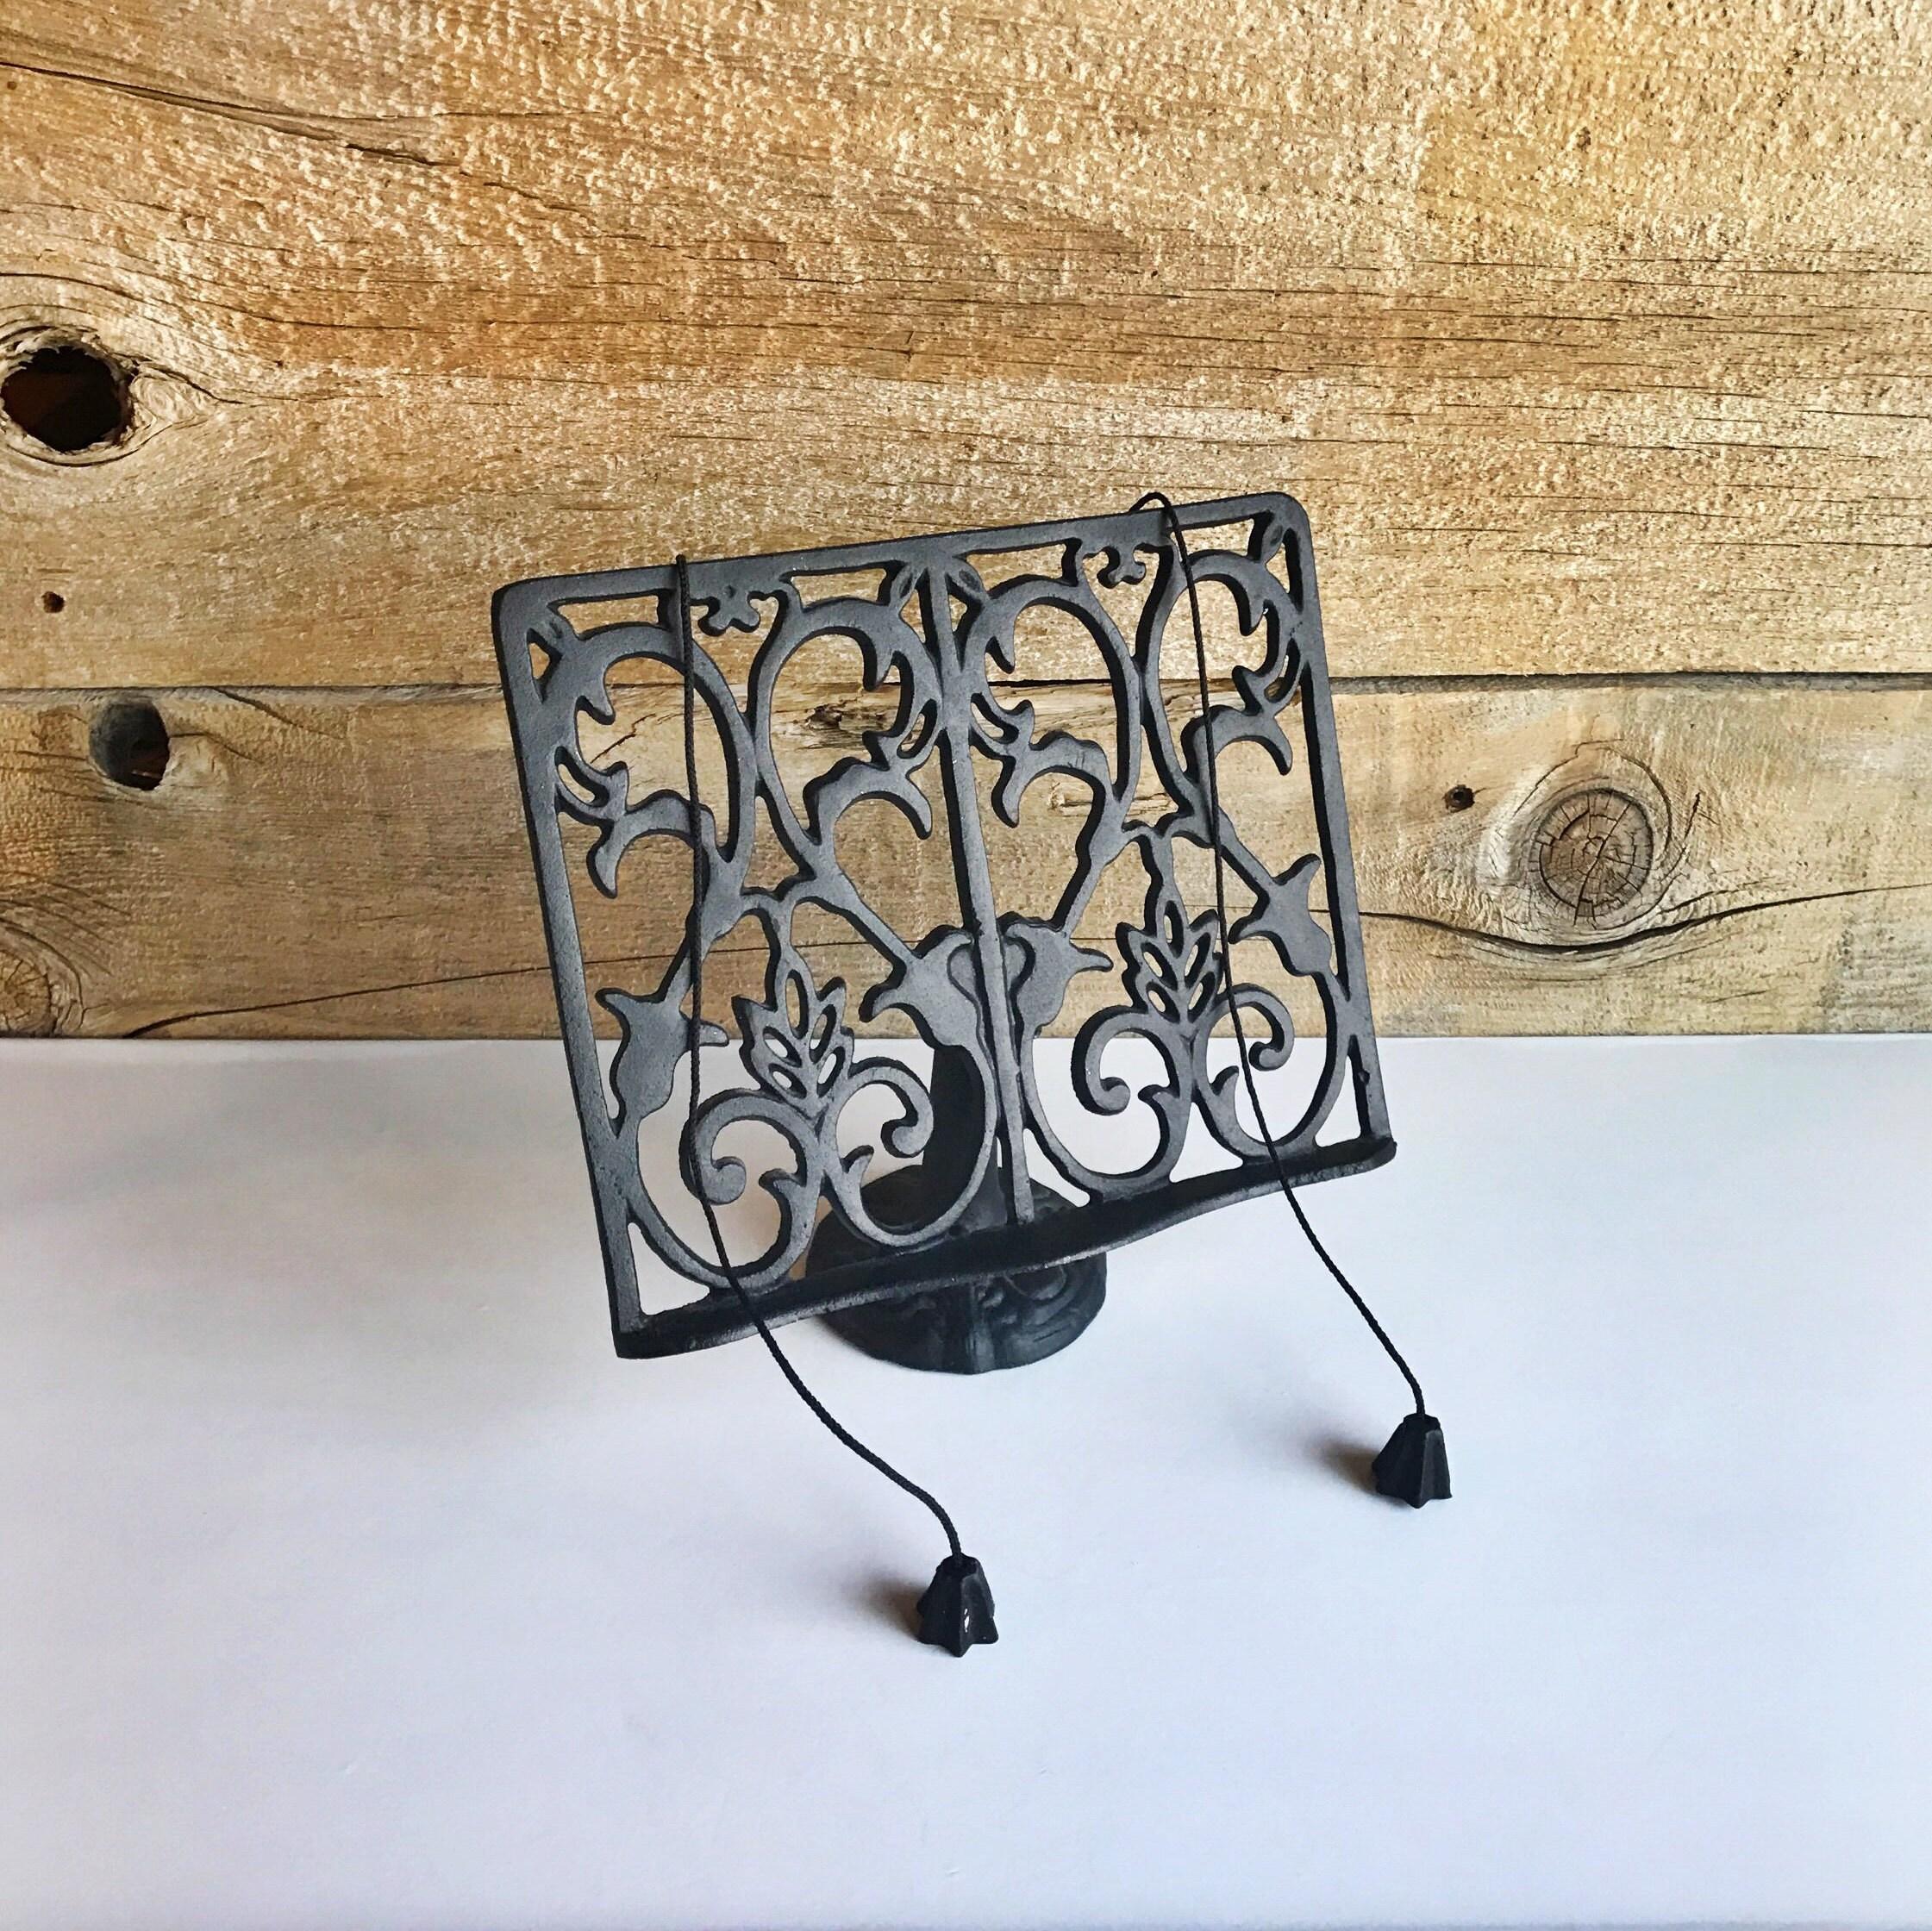 cast iron book holder sheet music holder recipe book stand